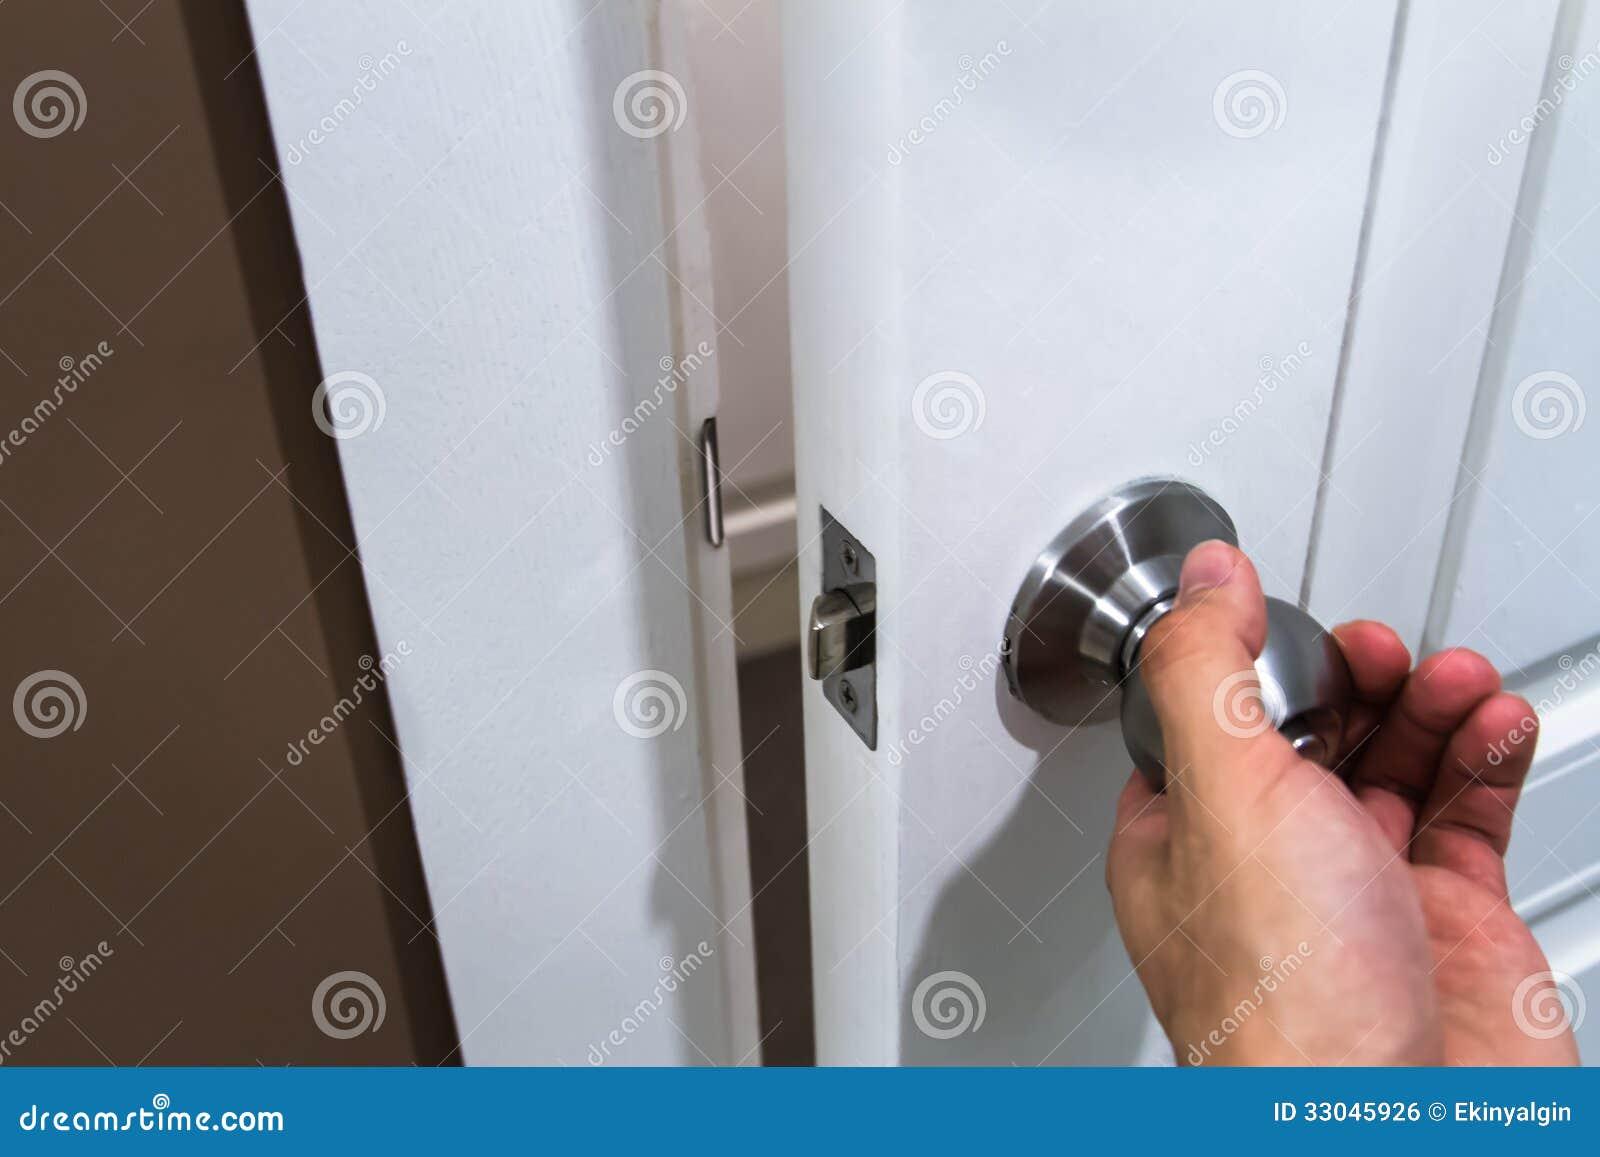 Hand Holding Door Knob Royalty Free Stock Image Image